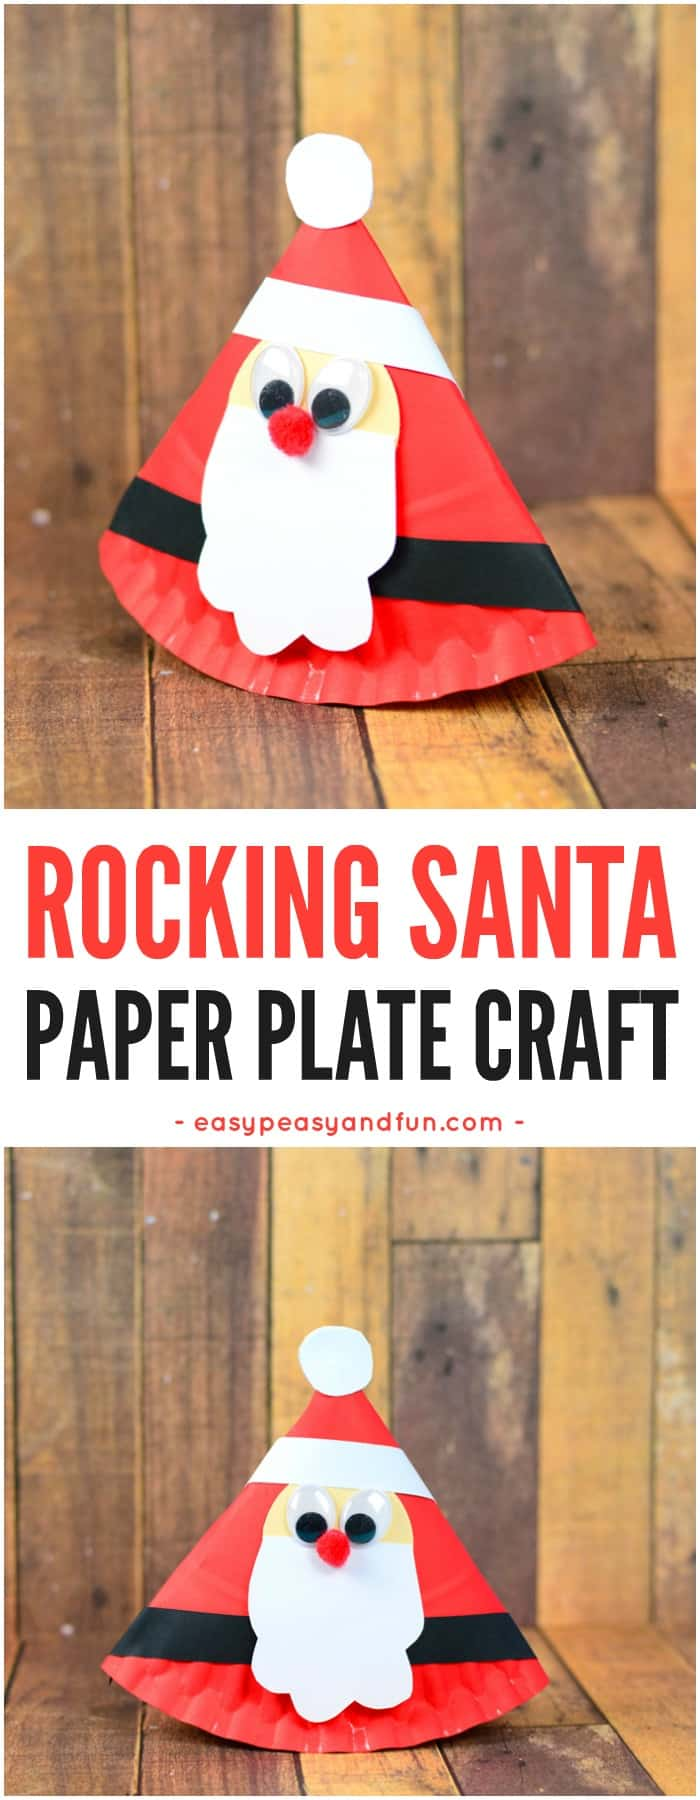 rocking paper plate santa easy peasy and fun